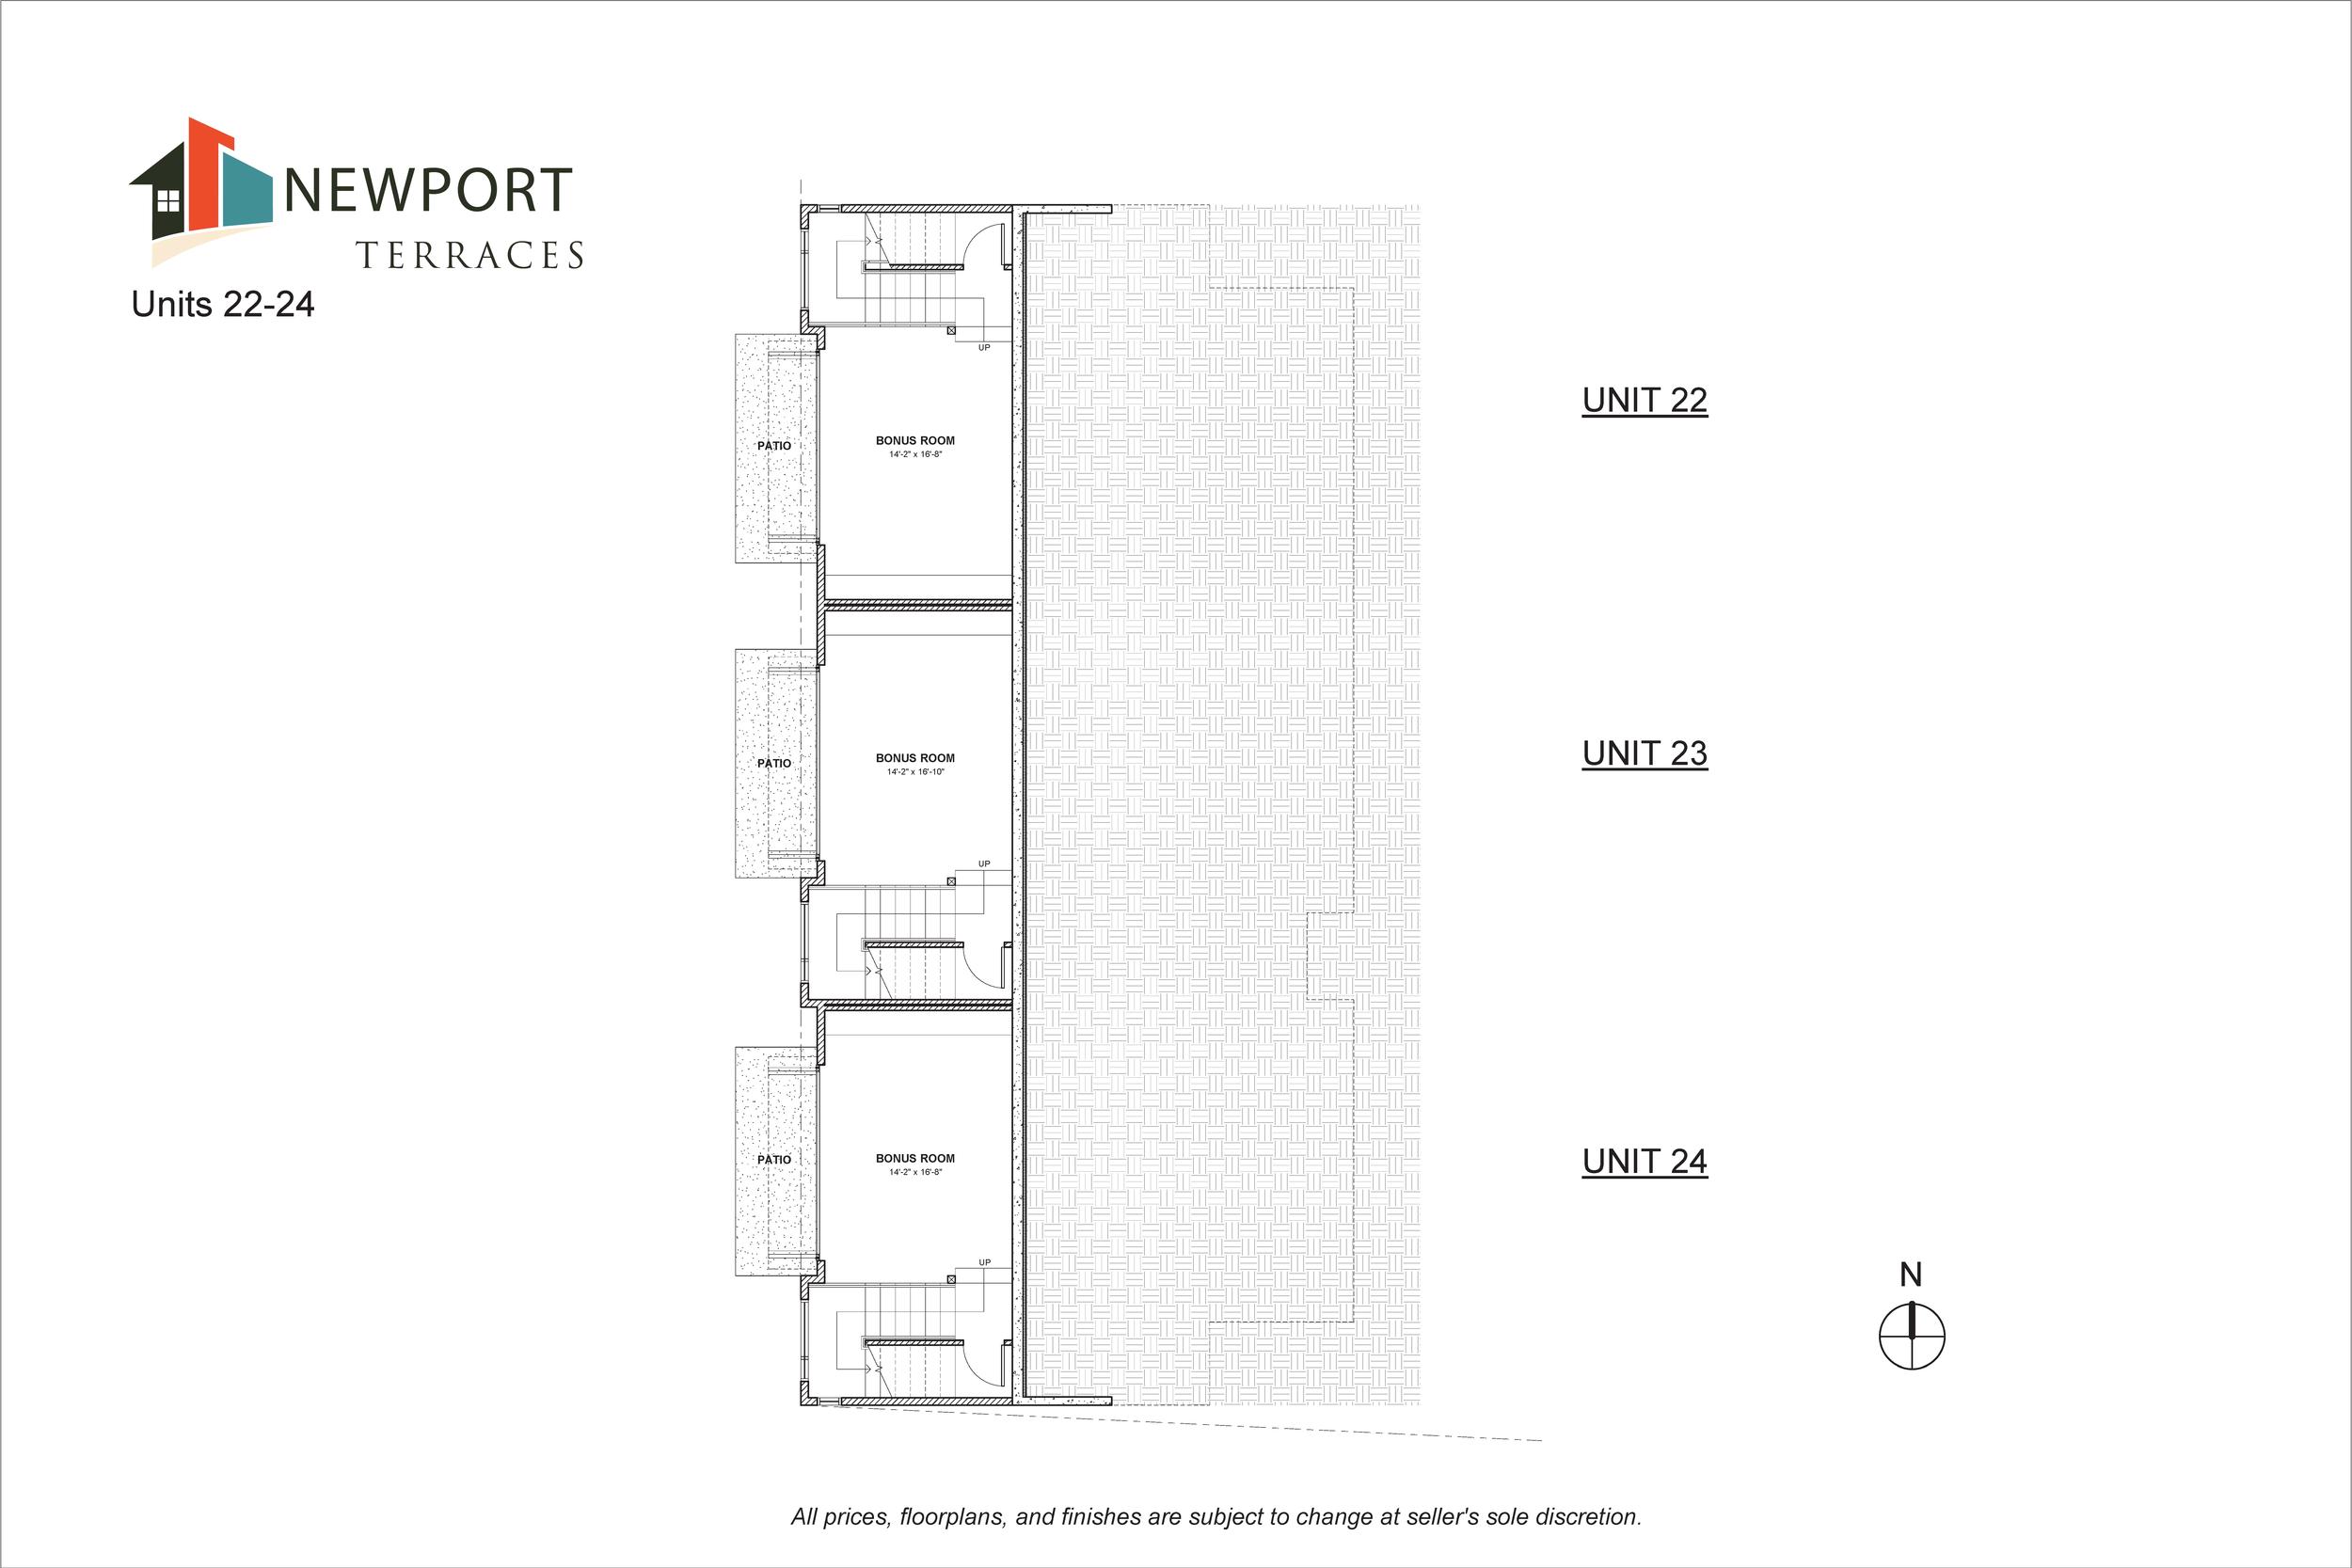 Newport Floorplans L22 L23 L24_Page_1.png